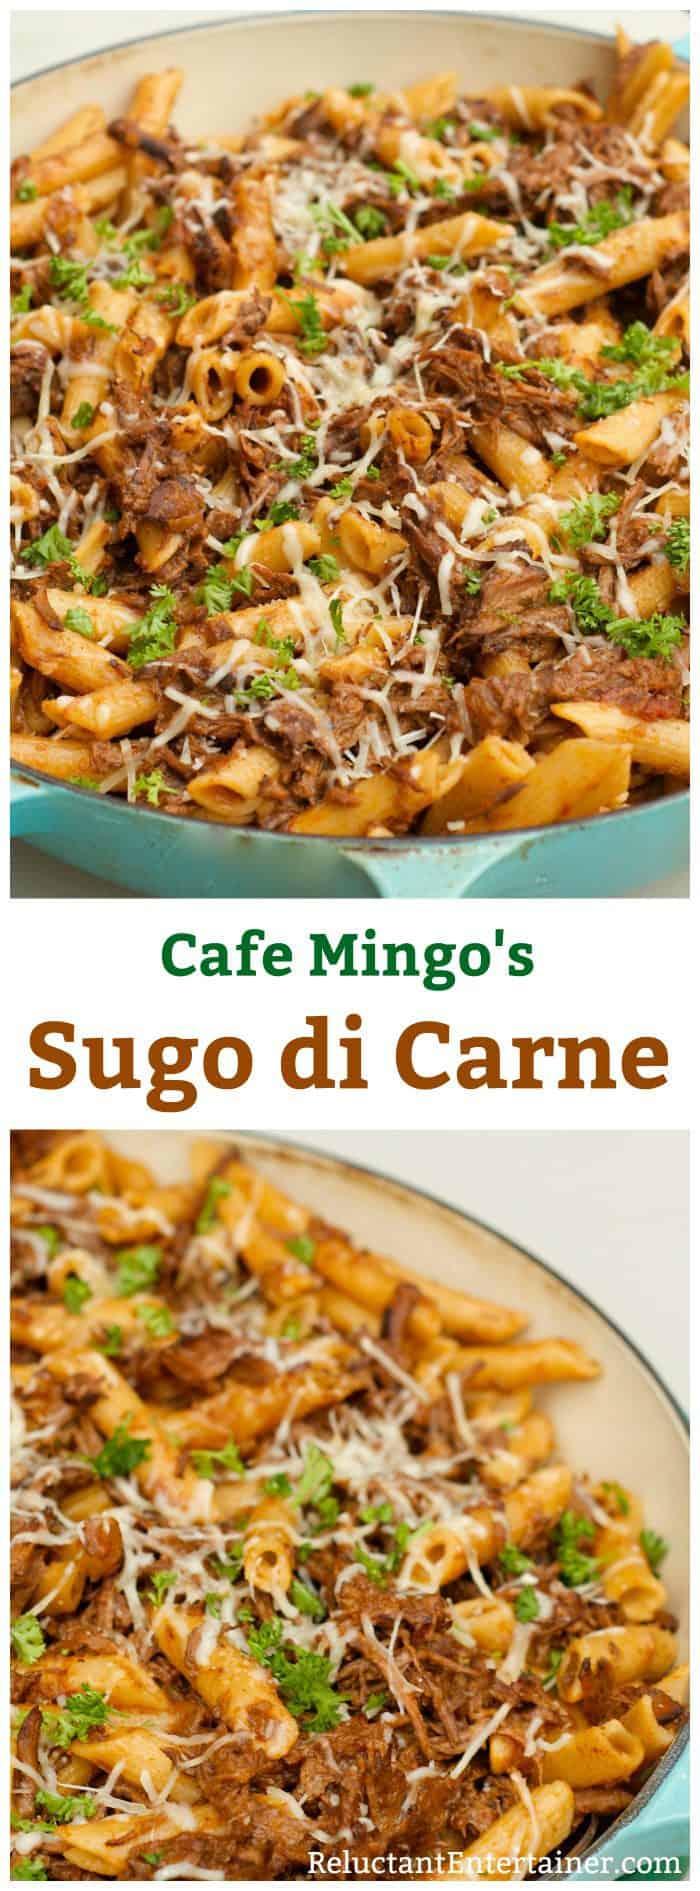 Cafe Mingo's Sugo di Carne